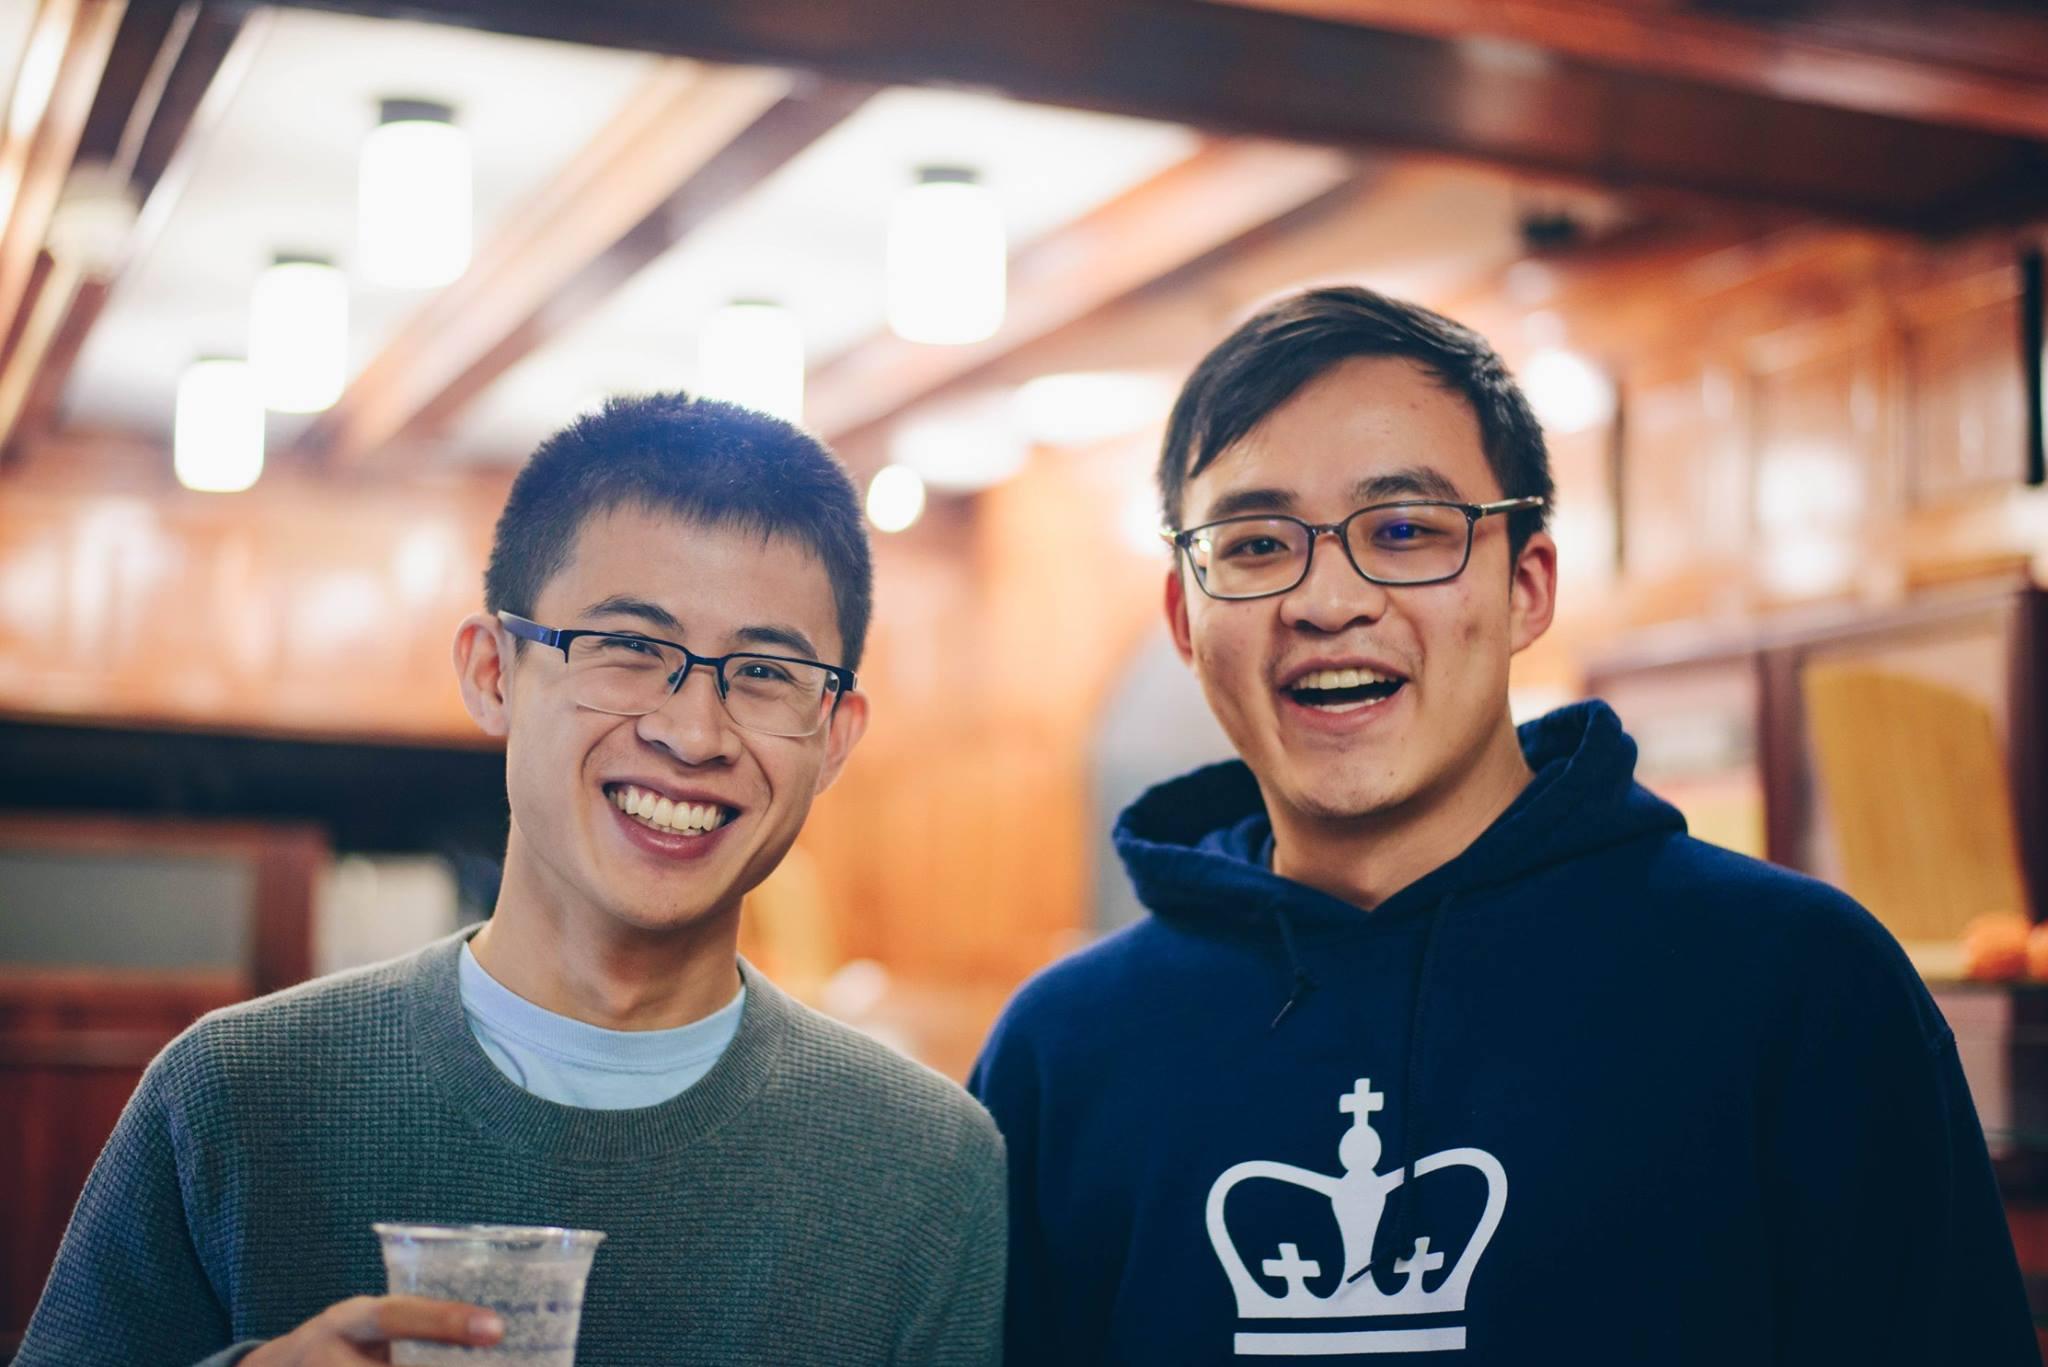 Bryan Lei and John Wang at the AP Hackathon in Spring 2018